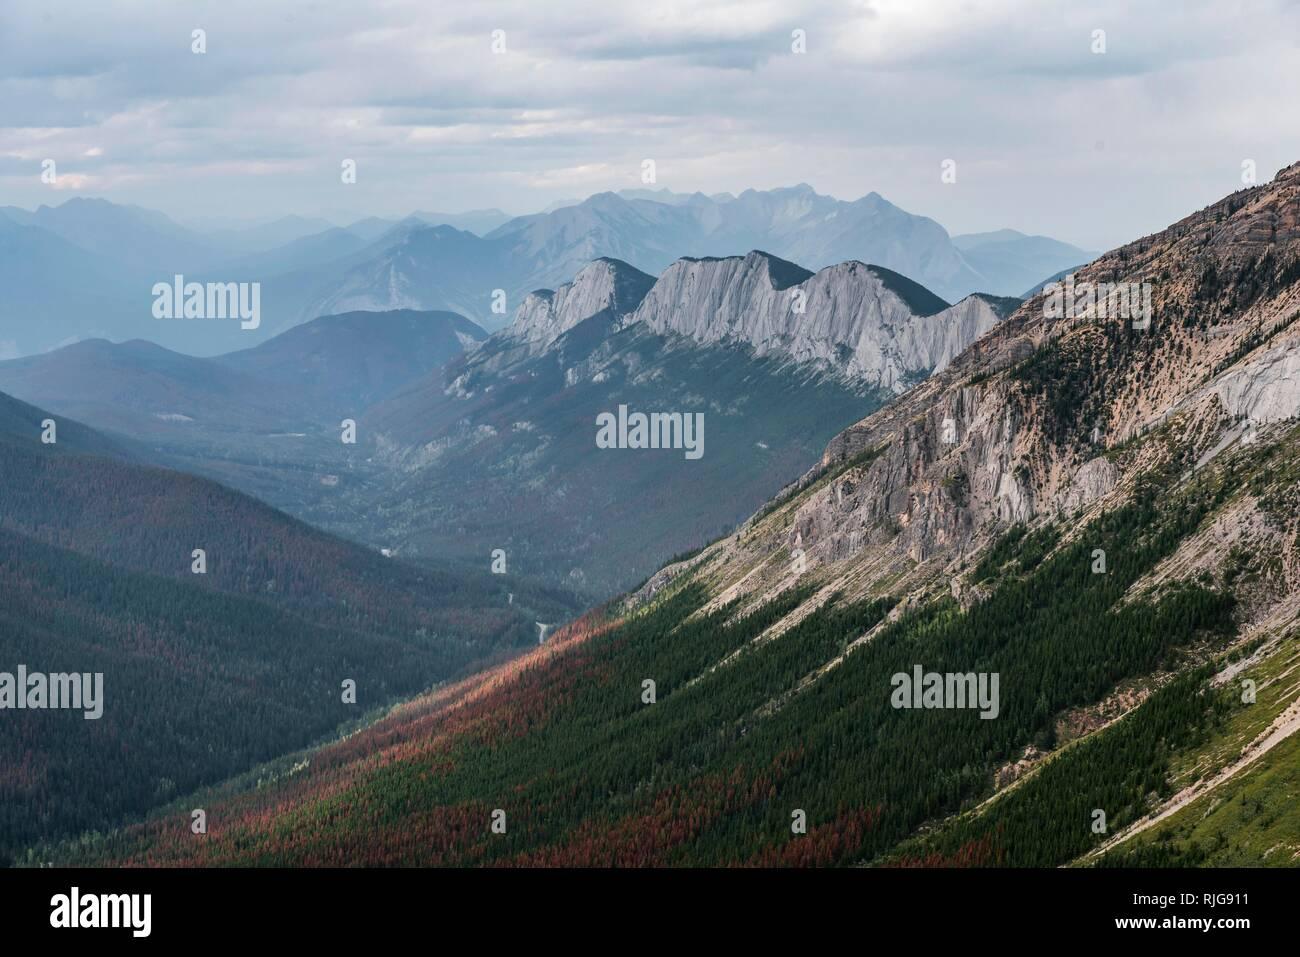 Striking mountain range, Ashlar Ridge, Jasper National Park, British Columbia, Canada - Stock Image